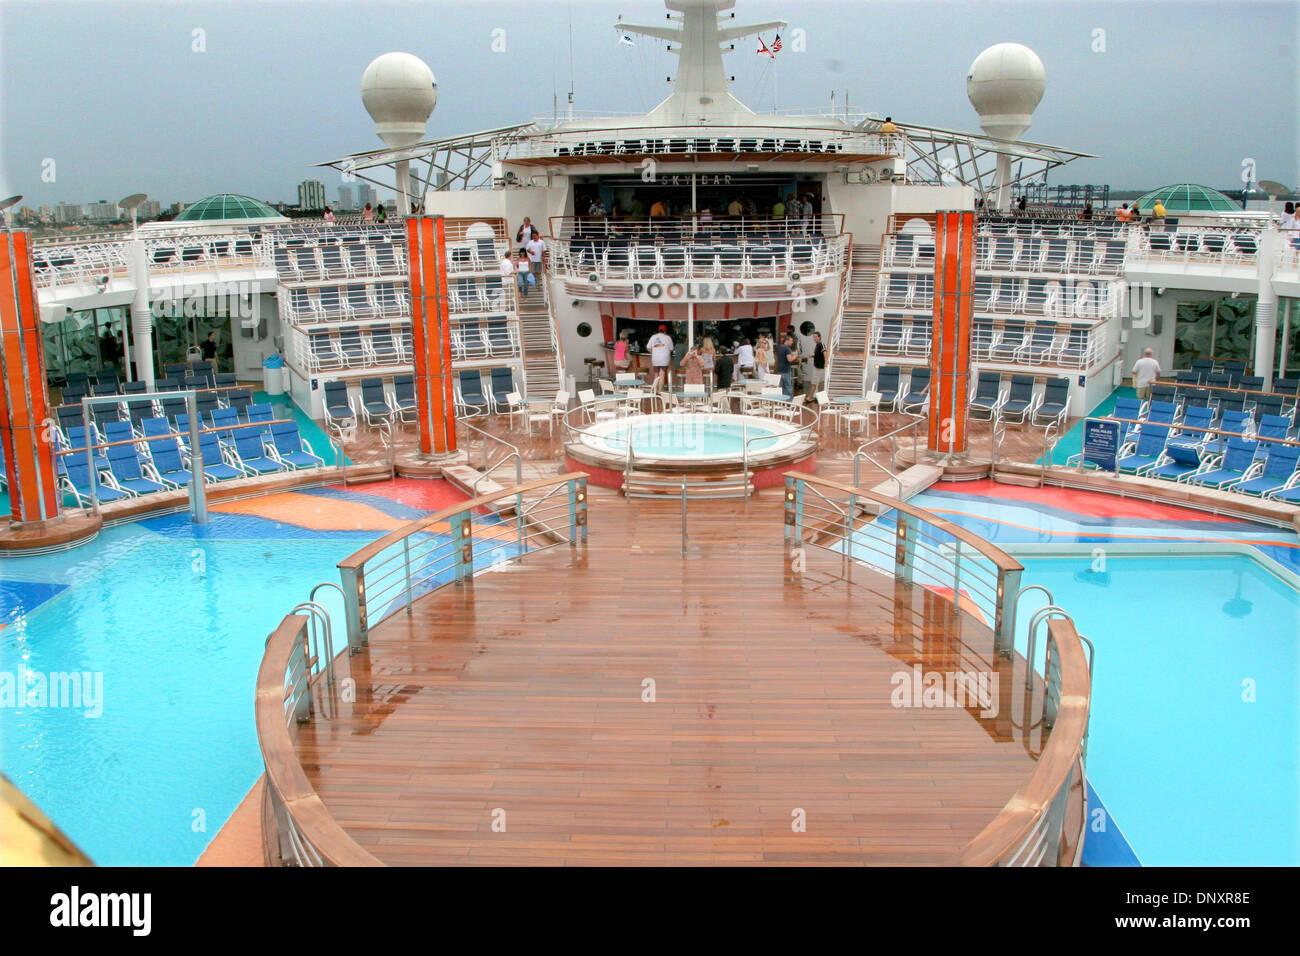 Swimming Pool Royal Caribbean Cruise Imágenes De Stock   Swimming ... 76d85f9b933e